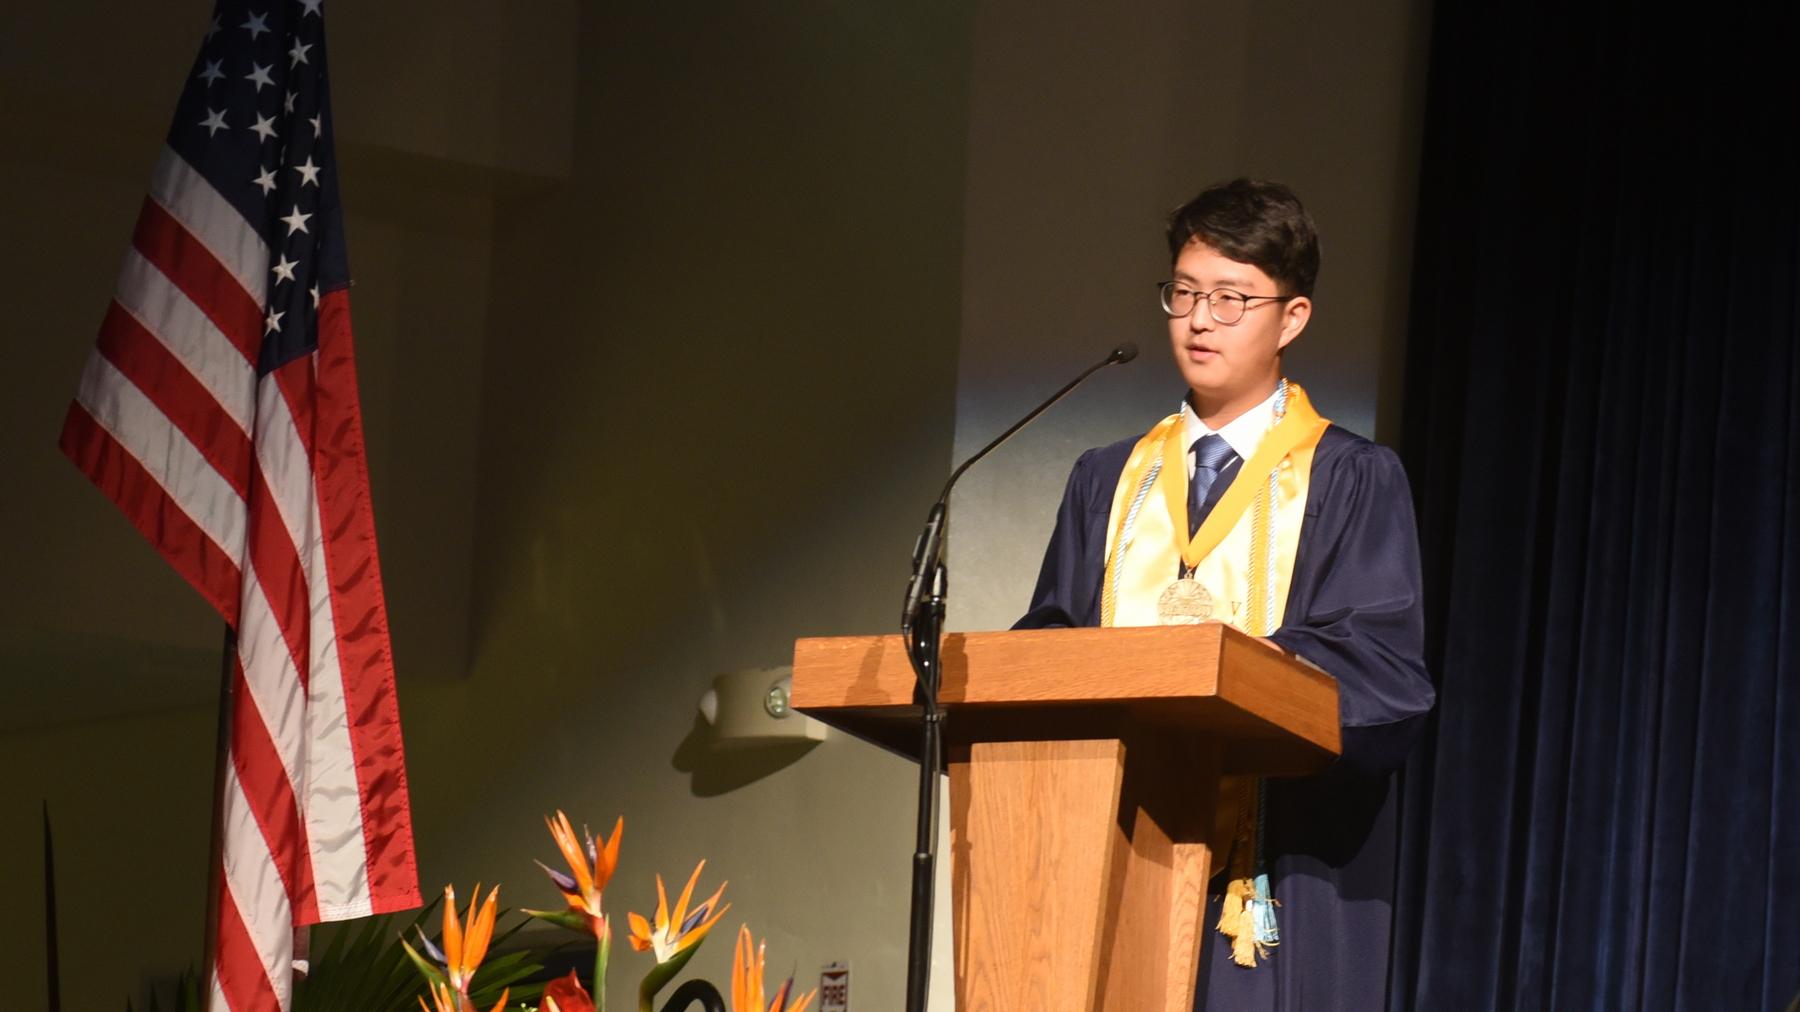 Valedictorian - Sechan Yoon